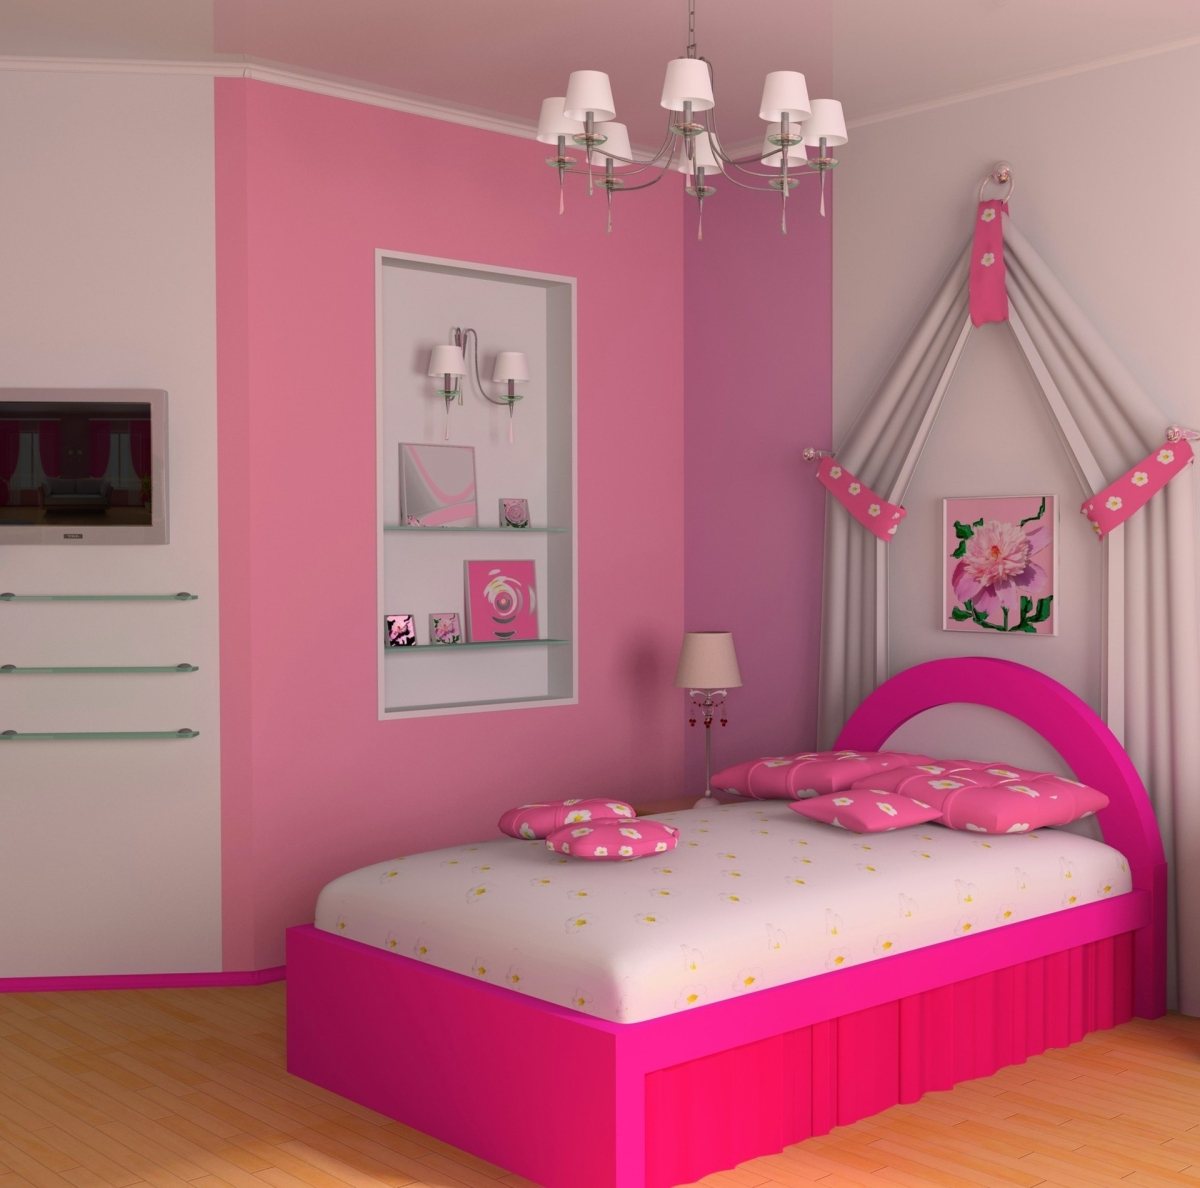 amusing simple girls bedroom ideas | Simple Pikn Barbie Themed Teen Girl Bedroom Design ...